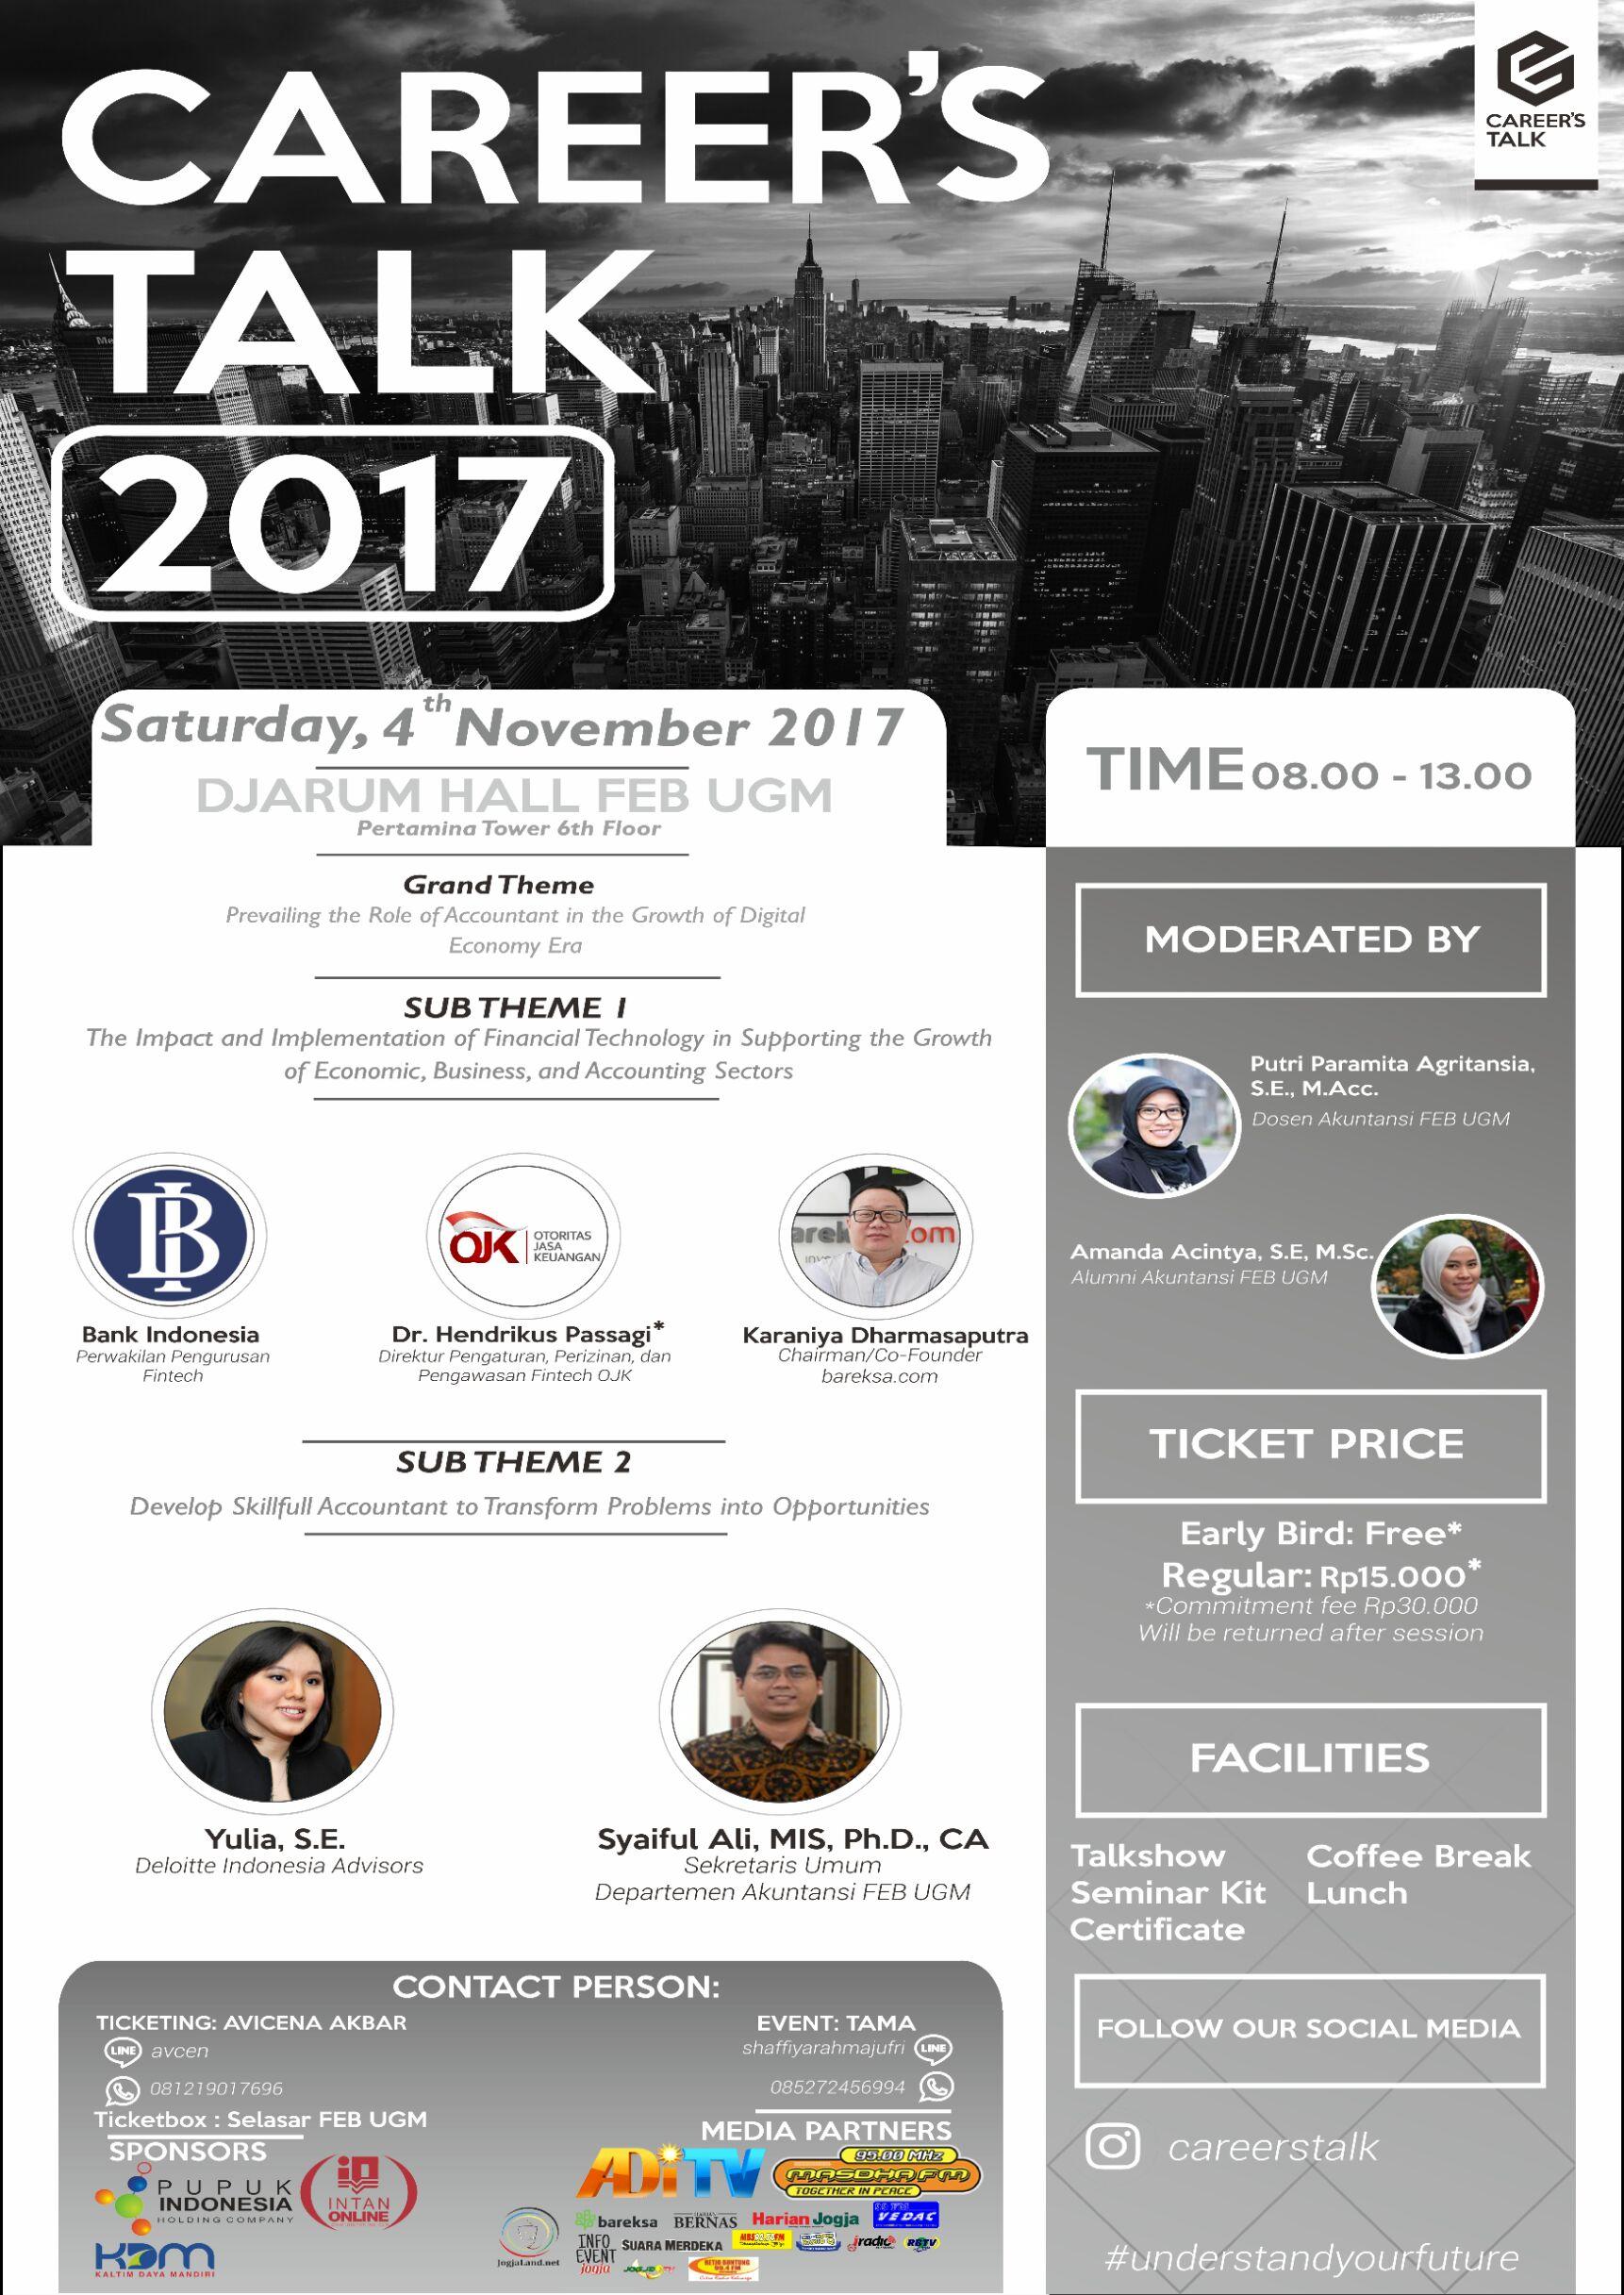 Permalink to Career's Talk 2017